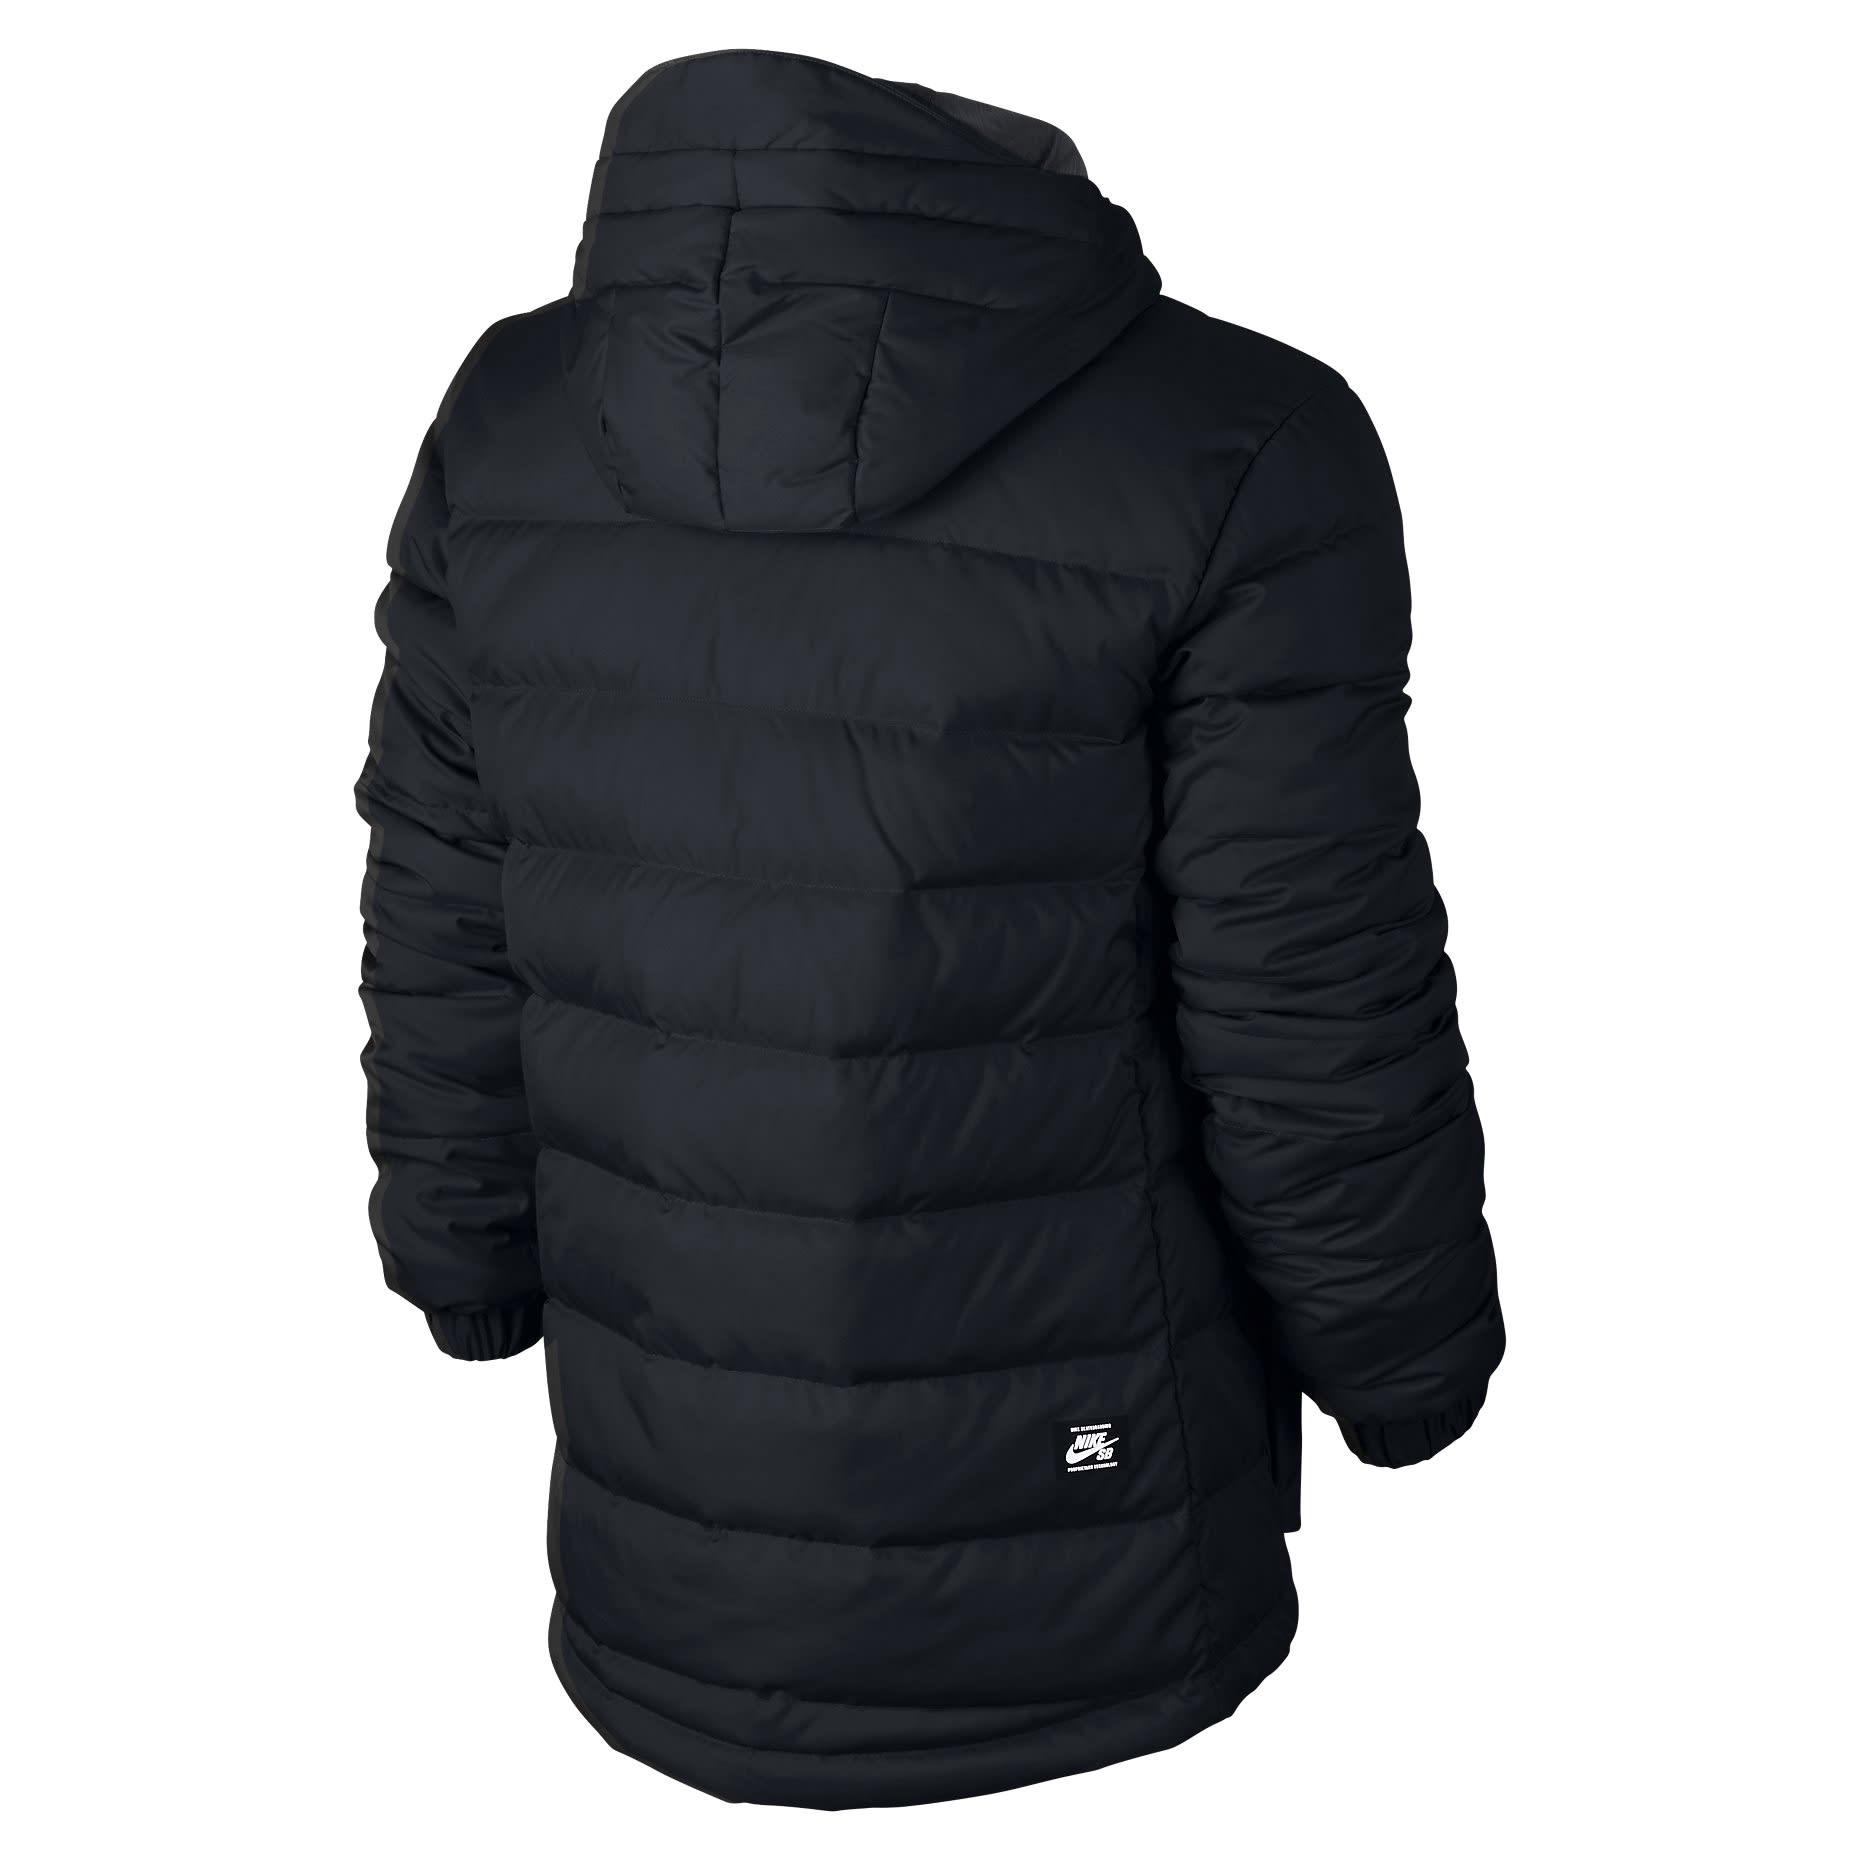 On Sale Nike Sb 550 Down Snowboard Jacket 2017